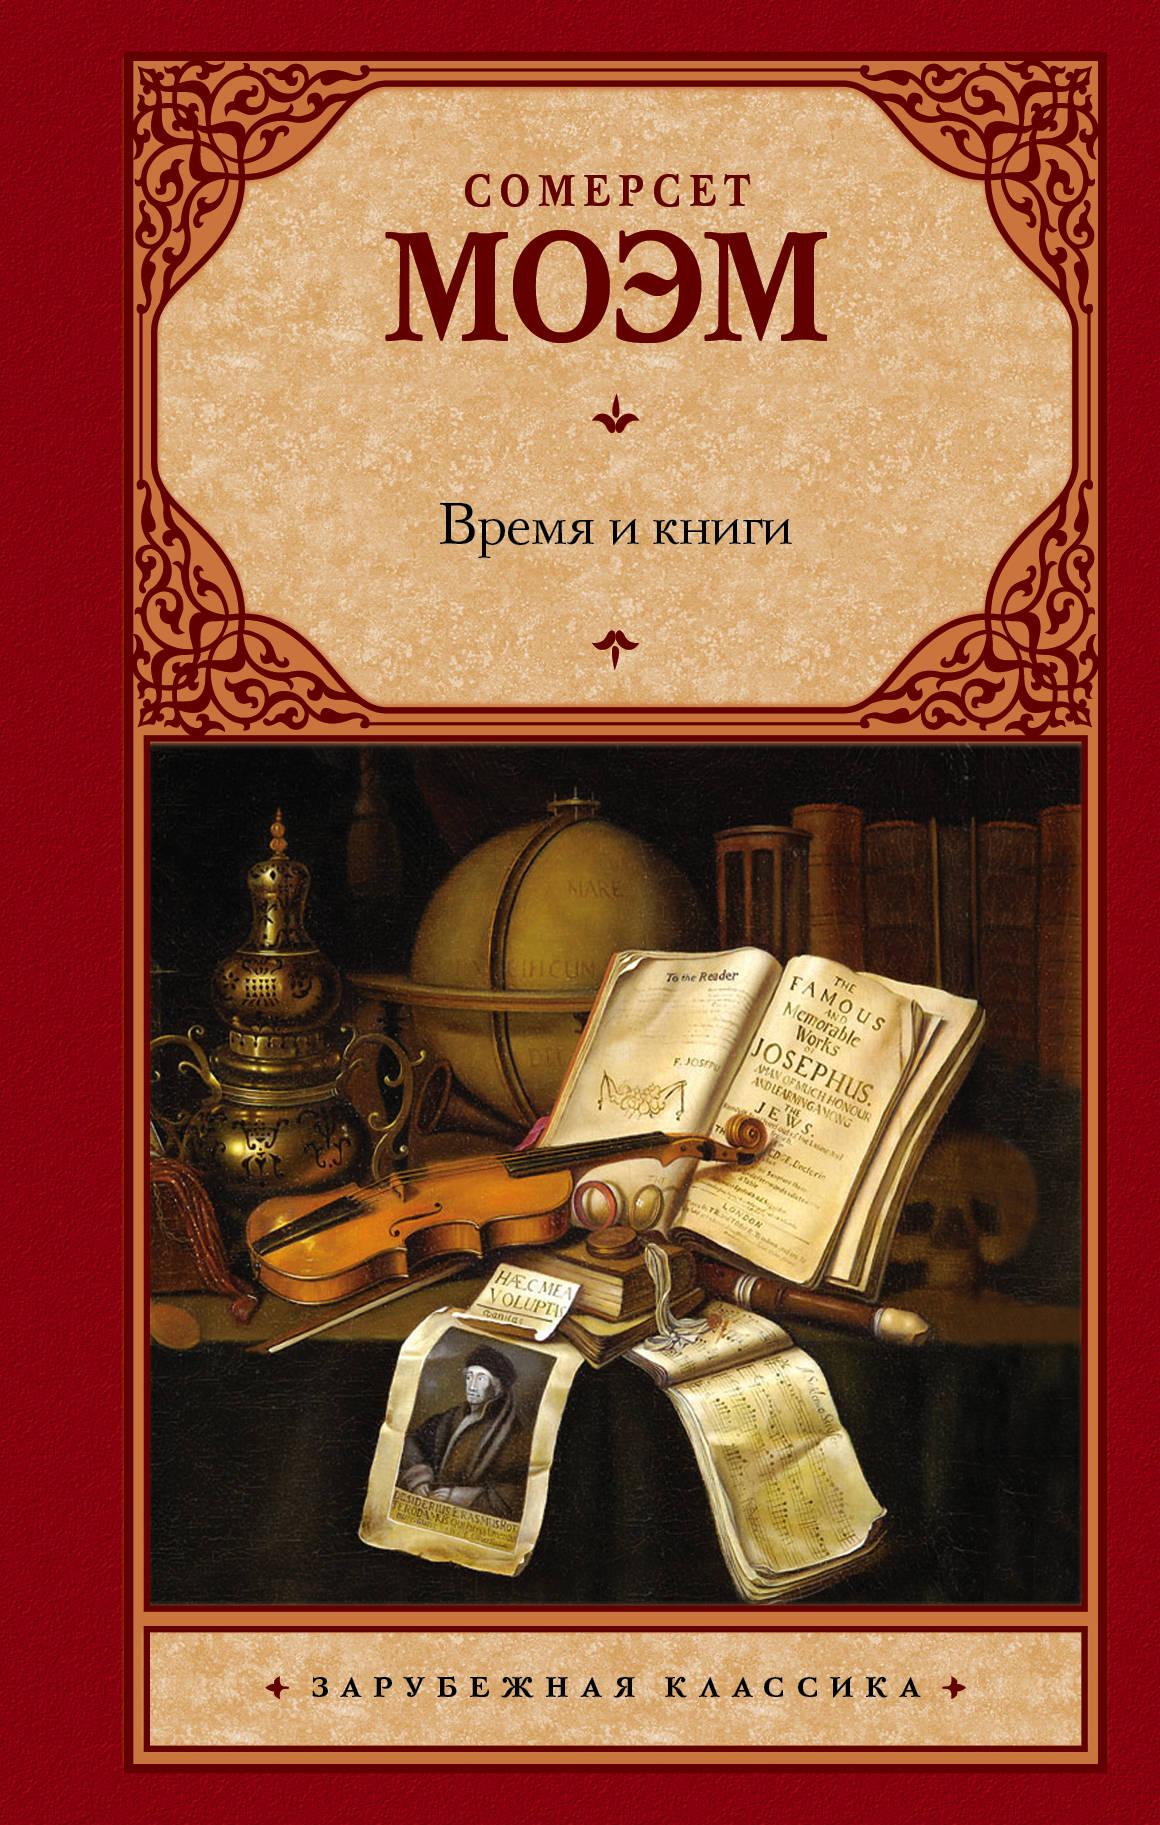 Собрание сочинений Сомерсета Моэма